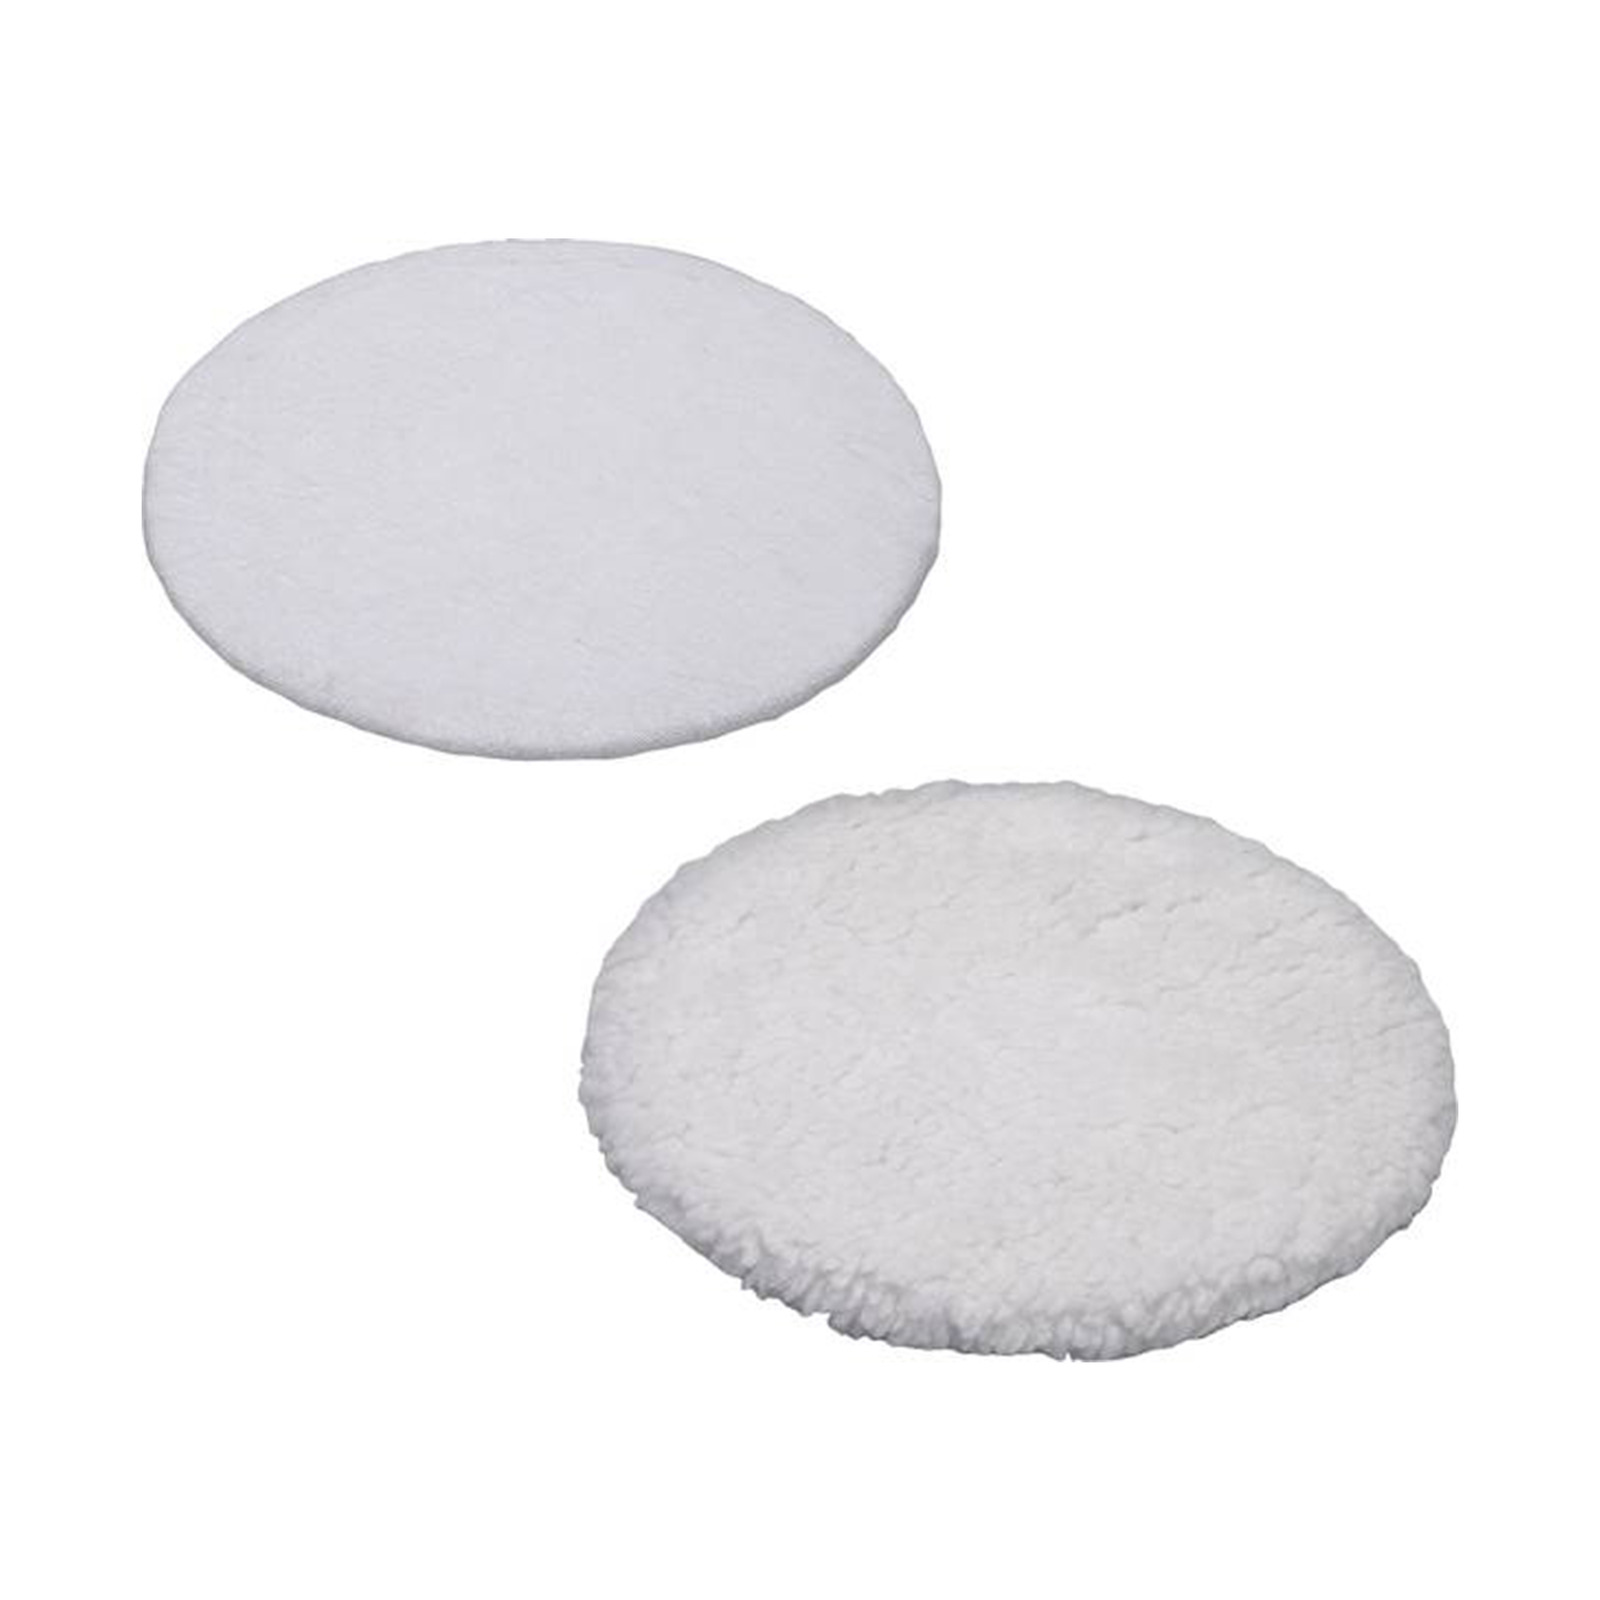 Einhell Einhell CE-CB18 CC-PO90 Polishing pads